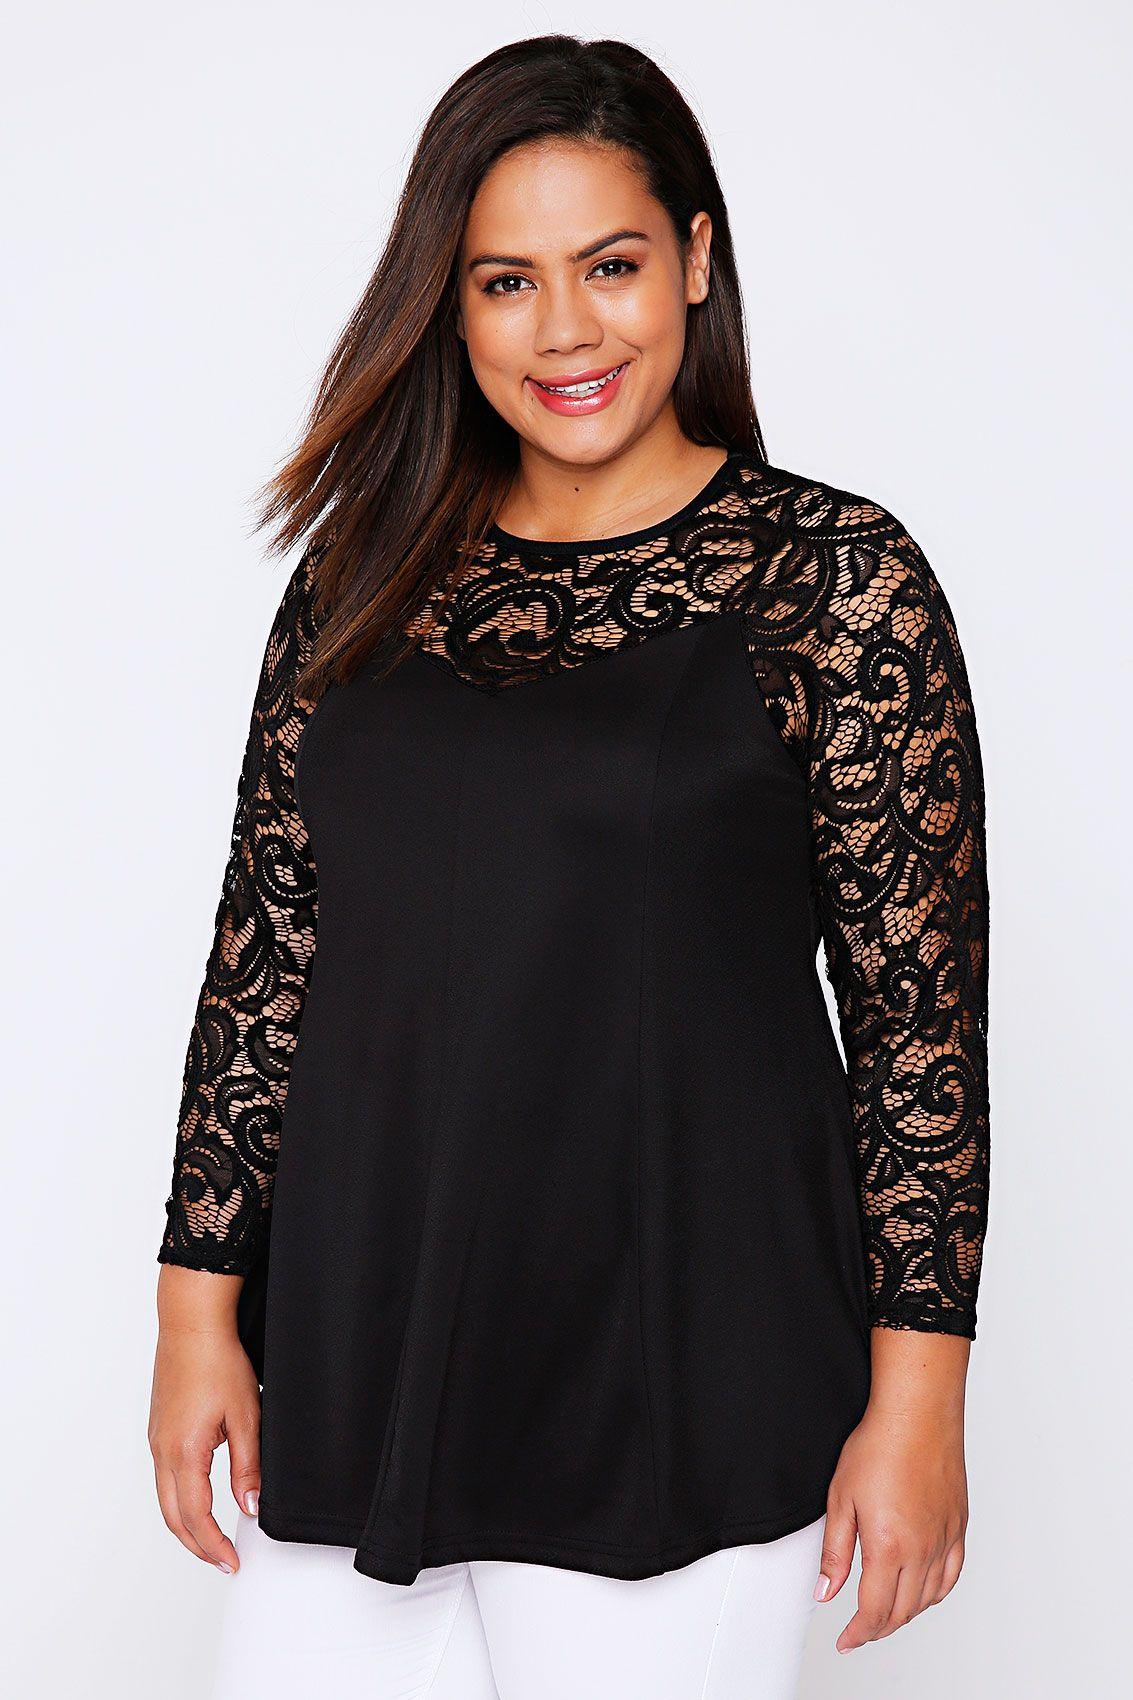 09b2f823e Black Jersey Peplum Top With Lace Yoke Fashion Updates, Fashion Trends, Evening  Tops,